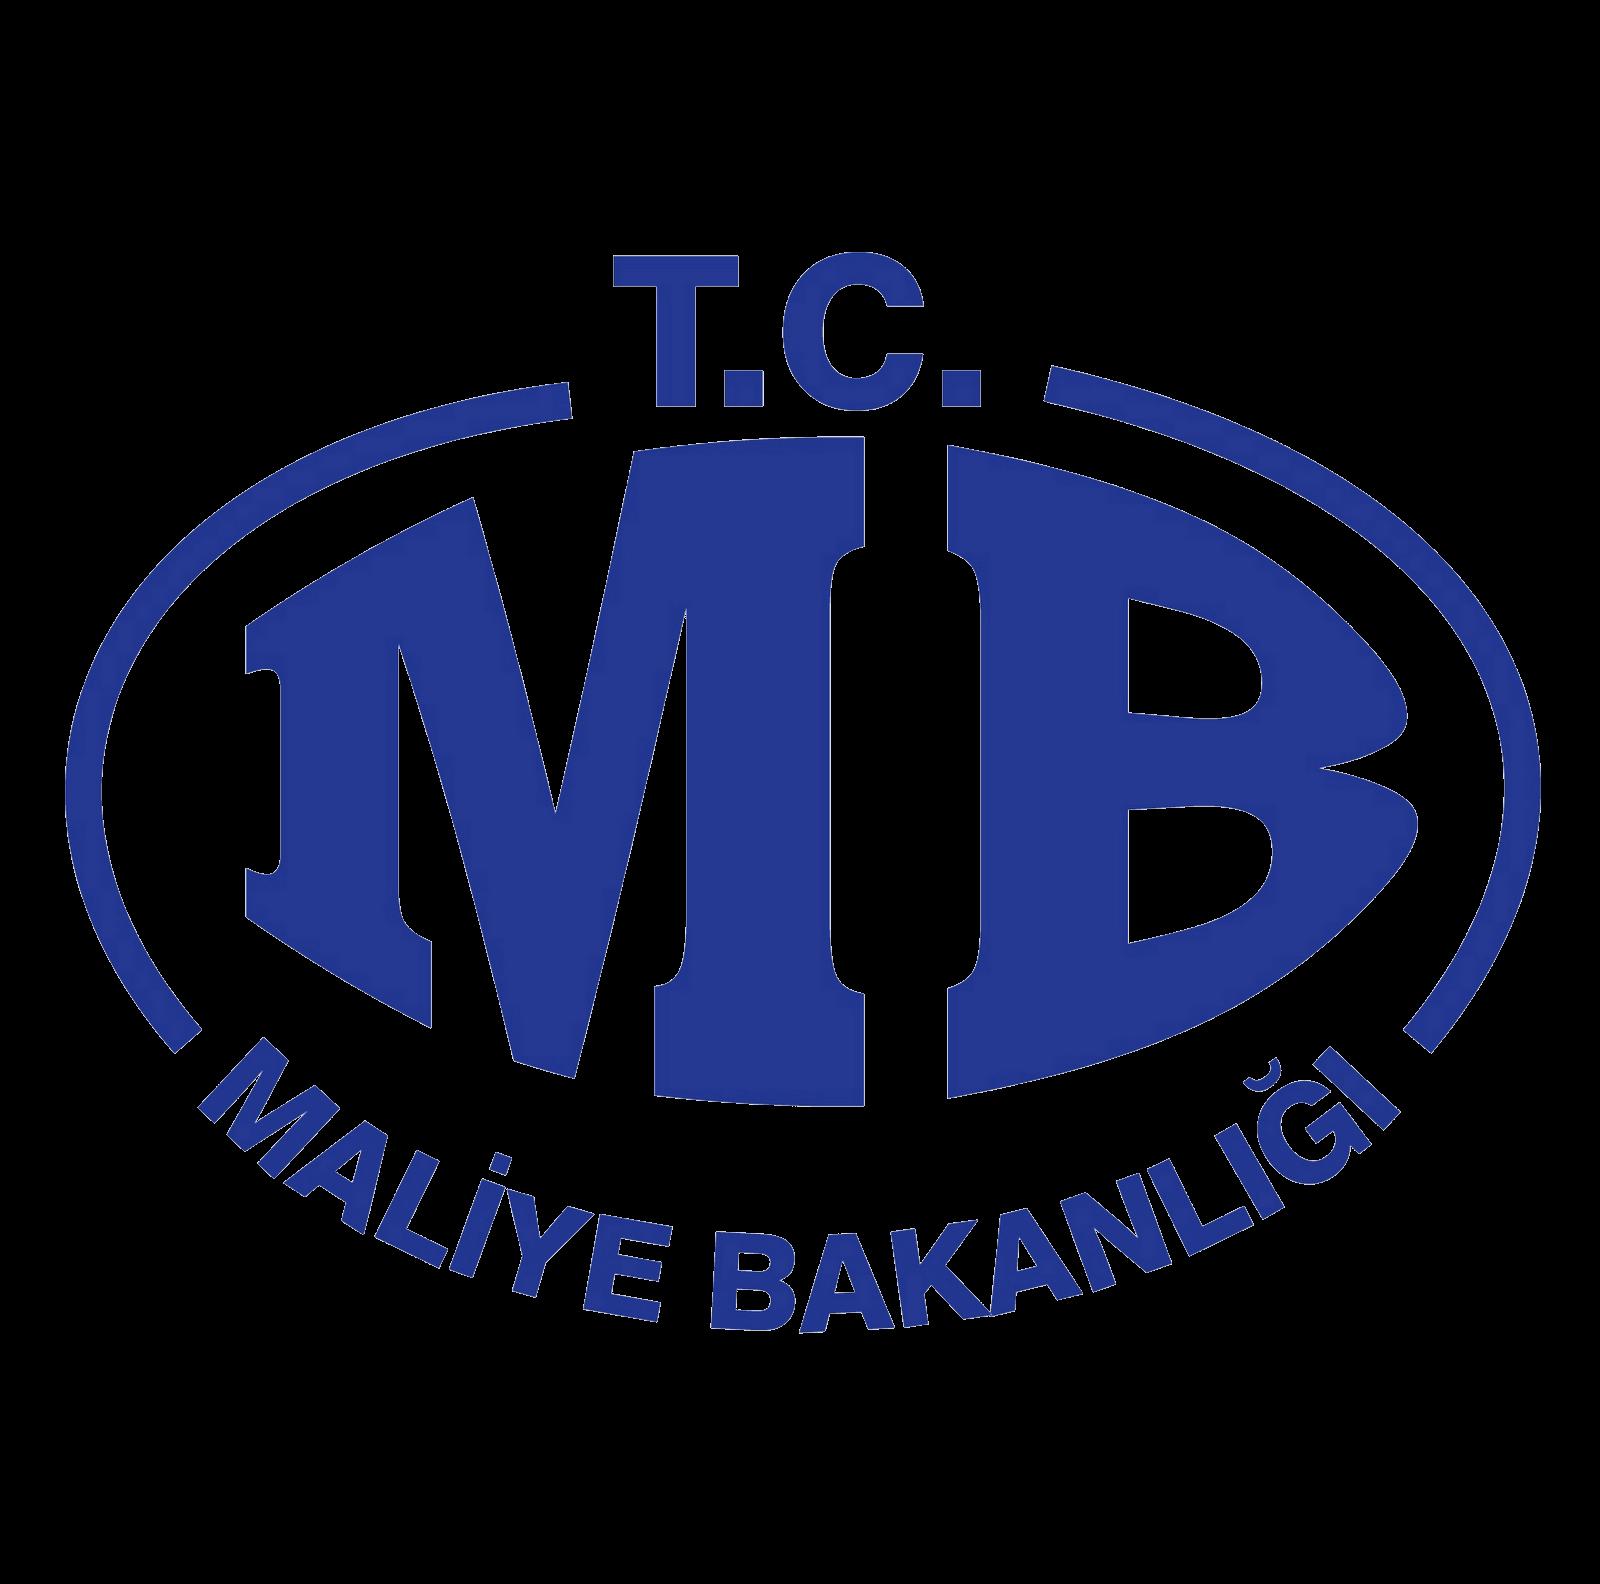 T.C. Maliye Bakanlığı Vektörel Logosu [maliye.gov.tr] png